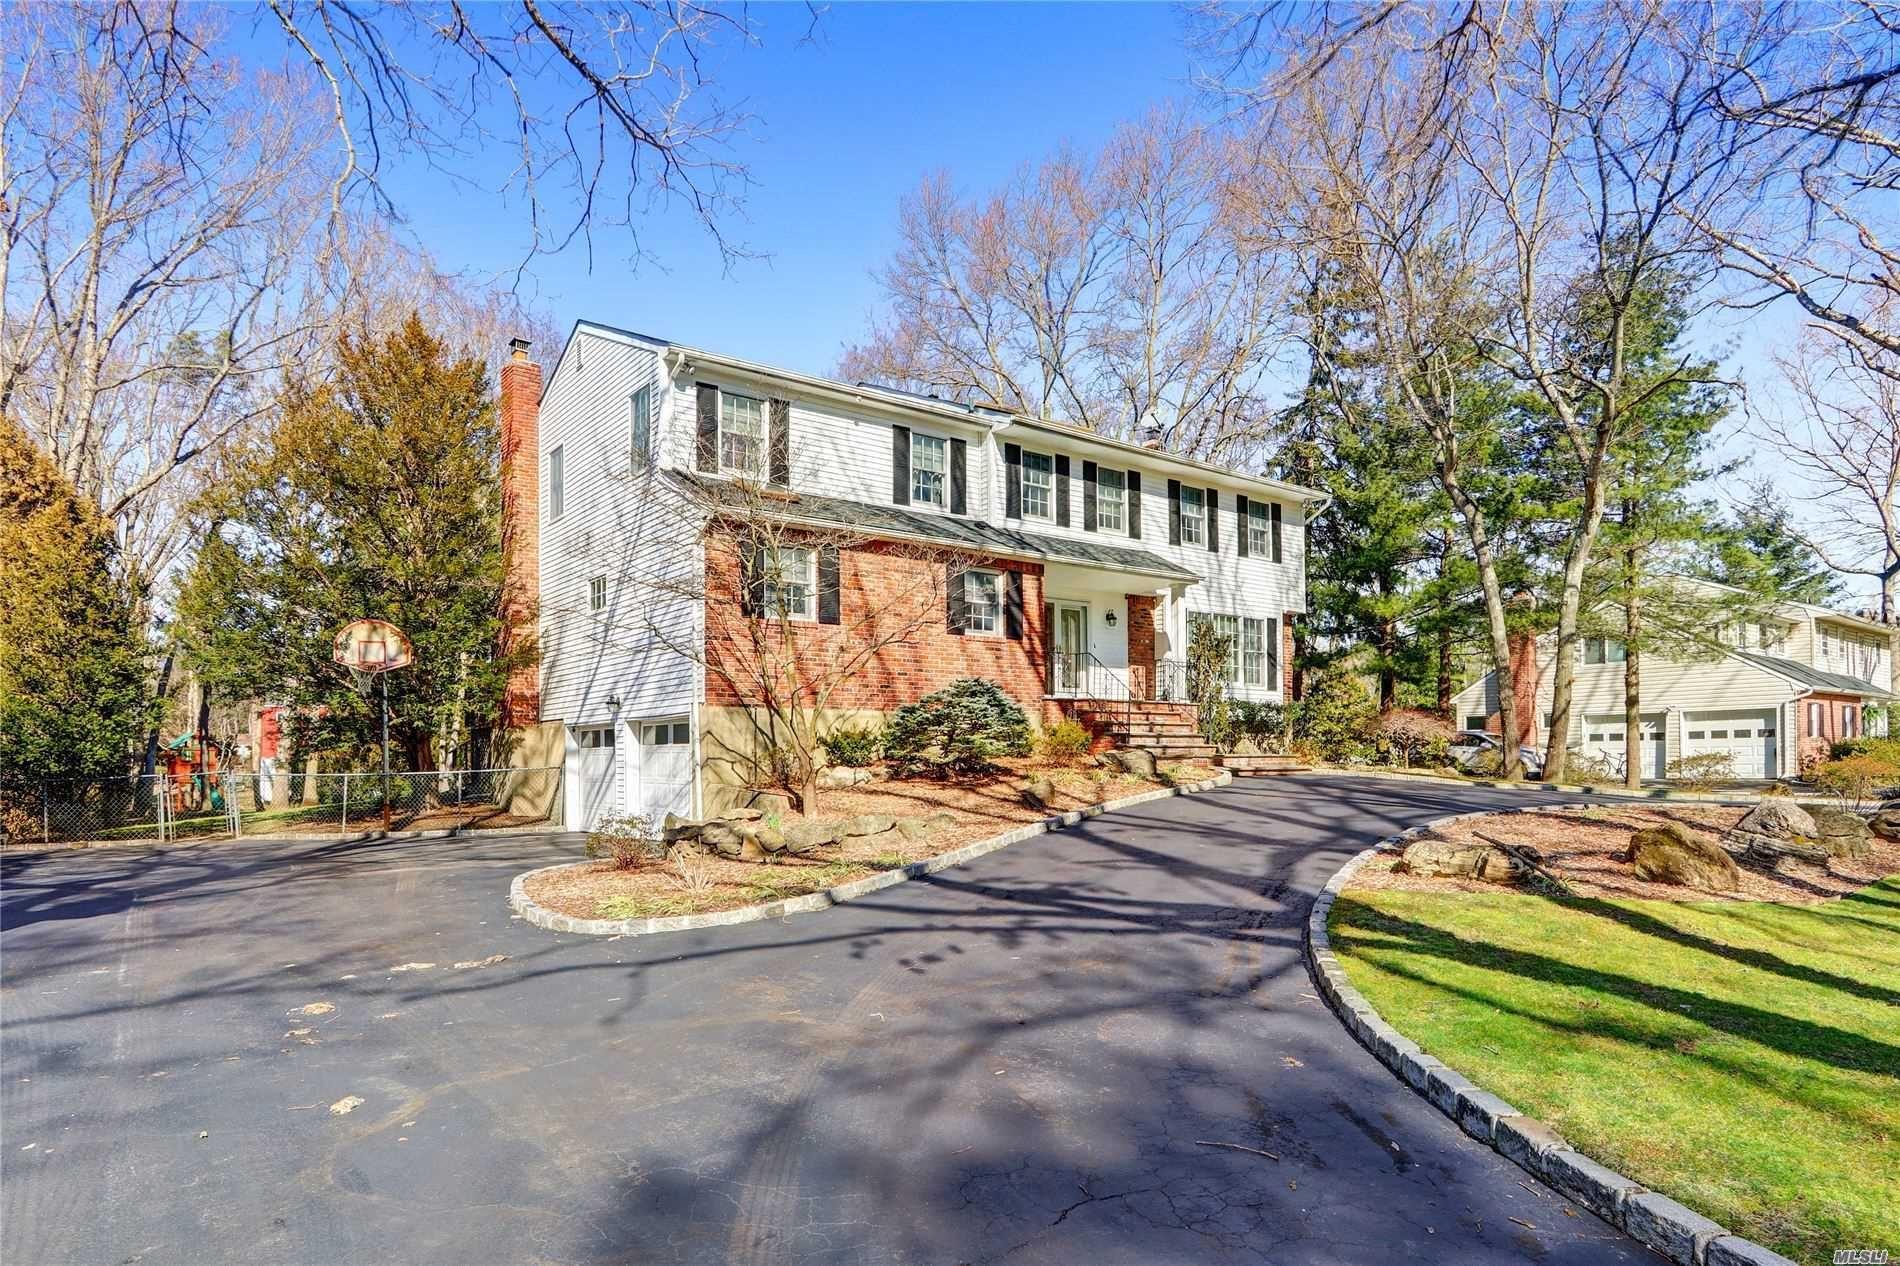 82 Mcculloch Drive, Dix Hills, NY 11746 - MLS#: 3201742